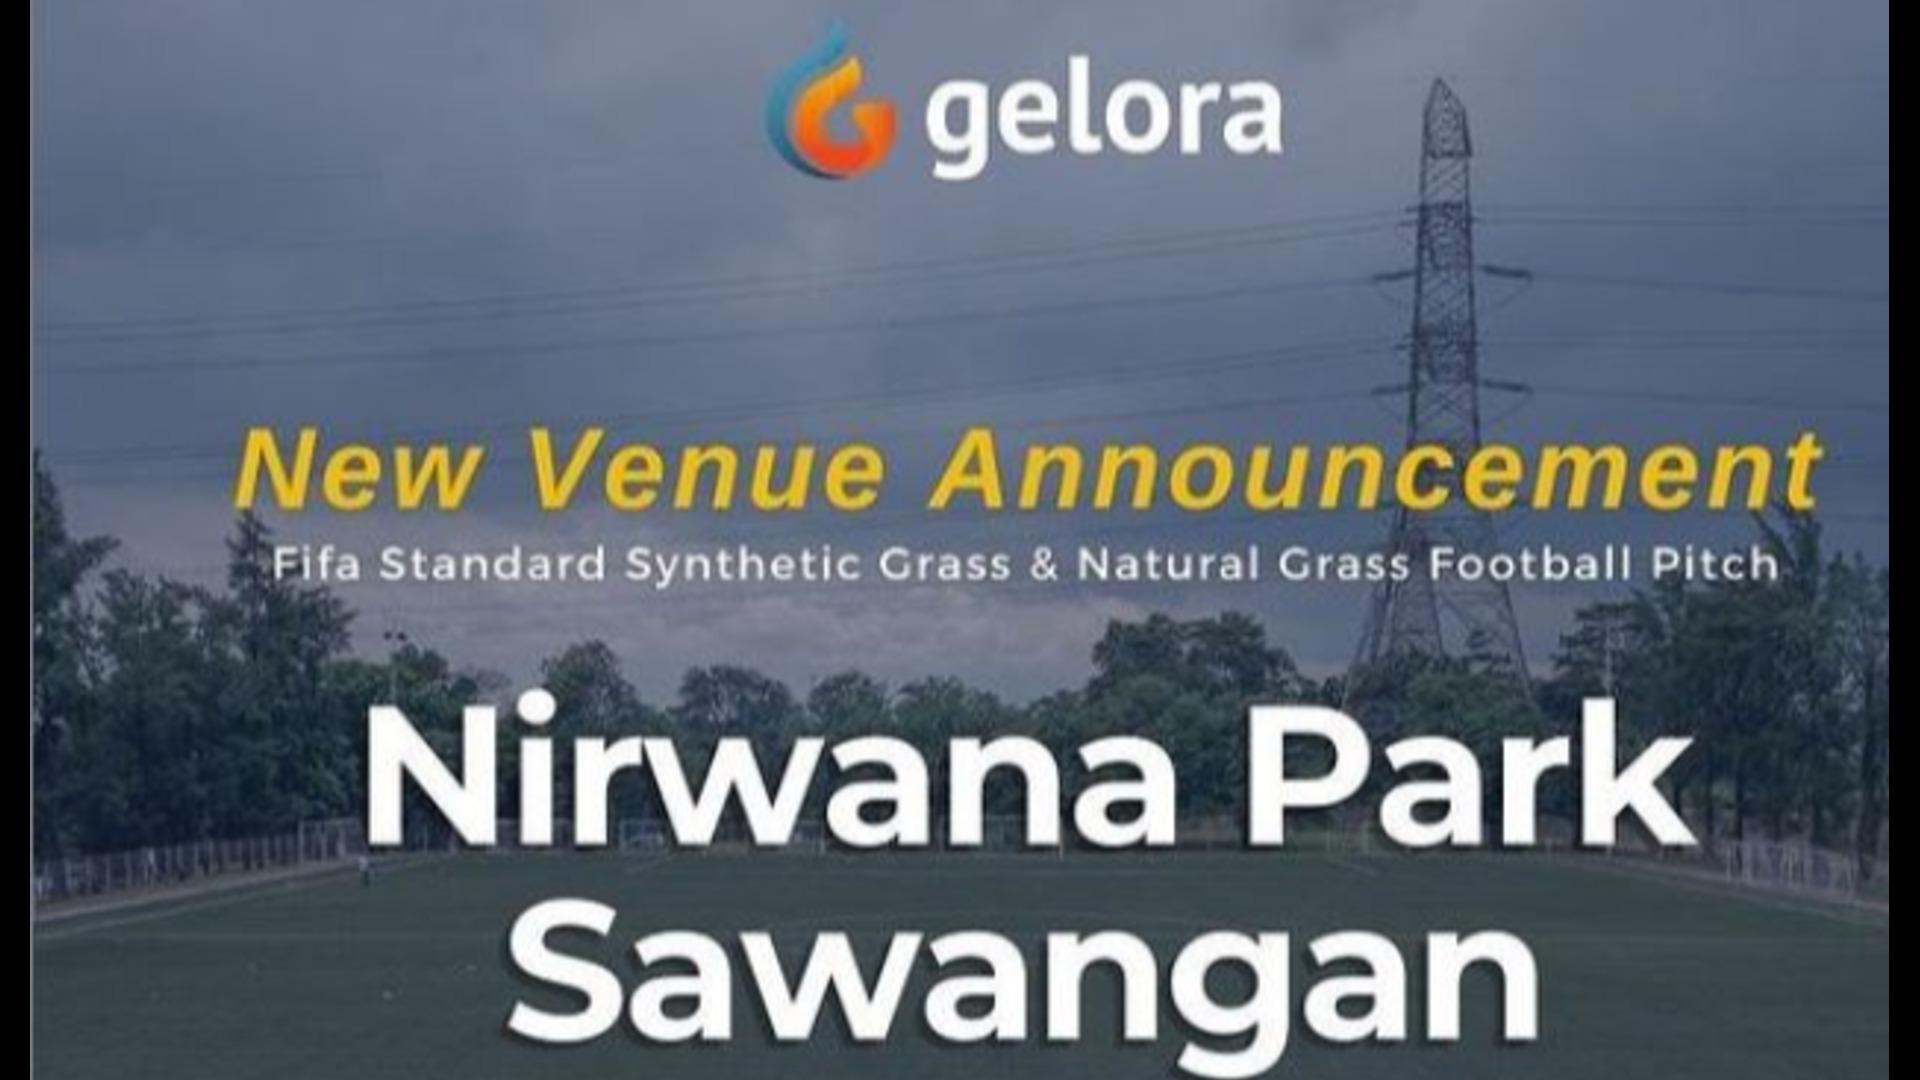 Gelora x Nirwana Park